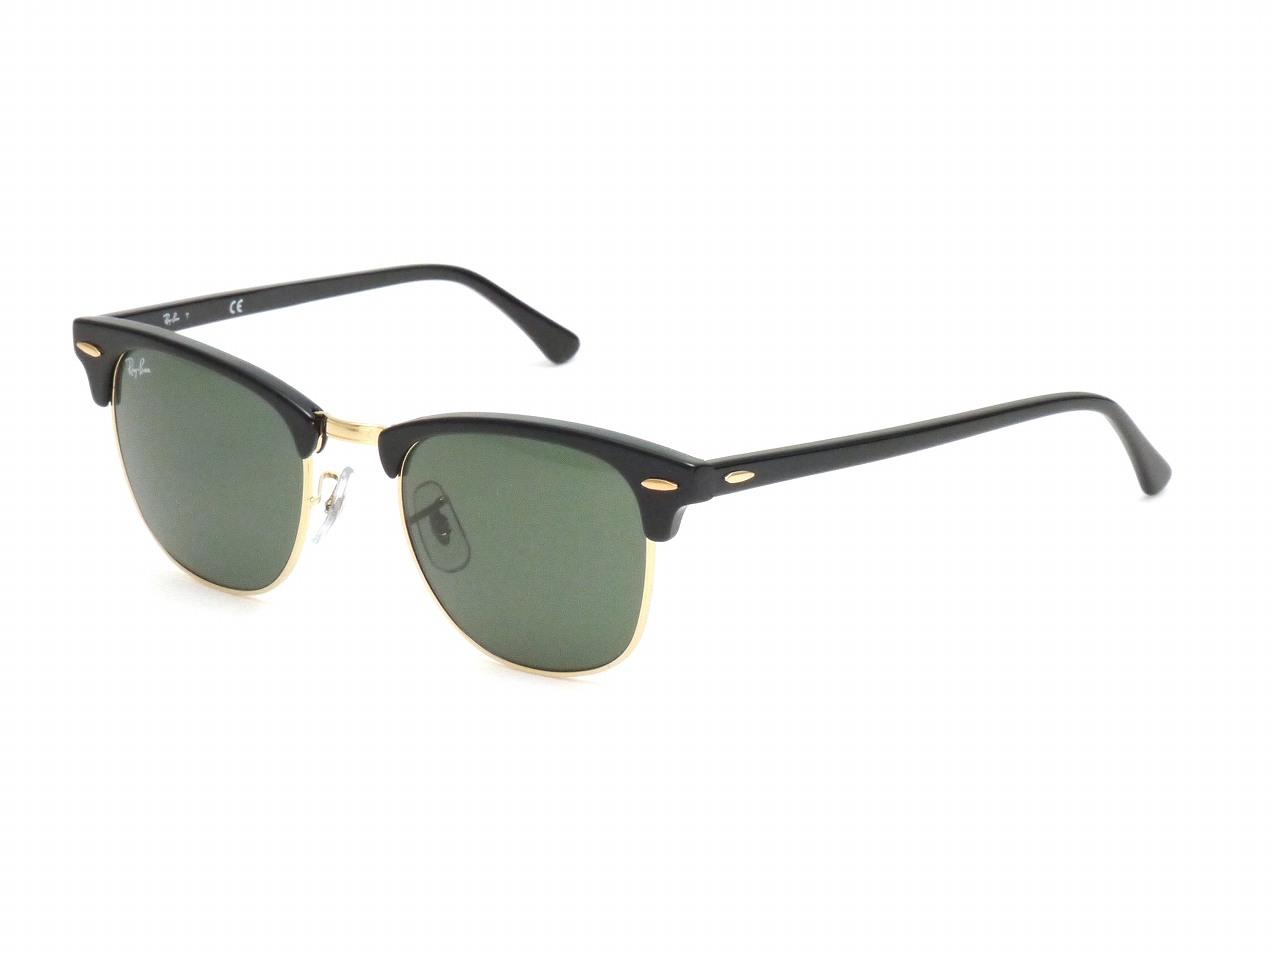 c53e84424e Bighit The total brand wholesale  Ray-Ban (Ray-Ban) club master sunglasses 3016  W0365(51) black   gold